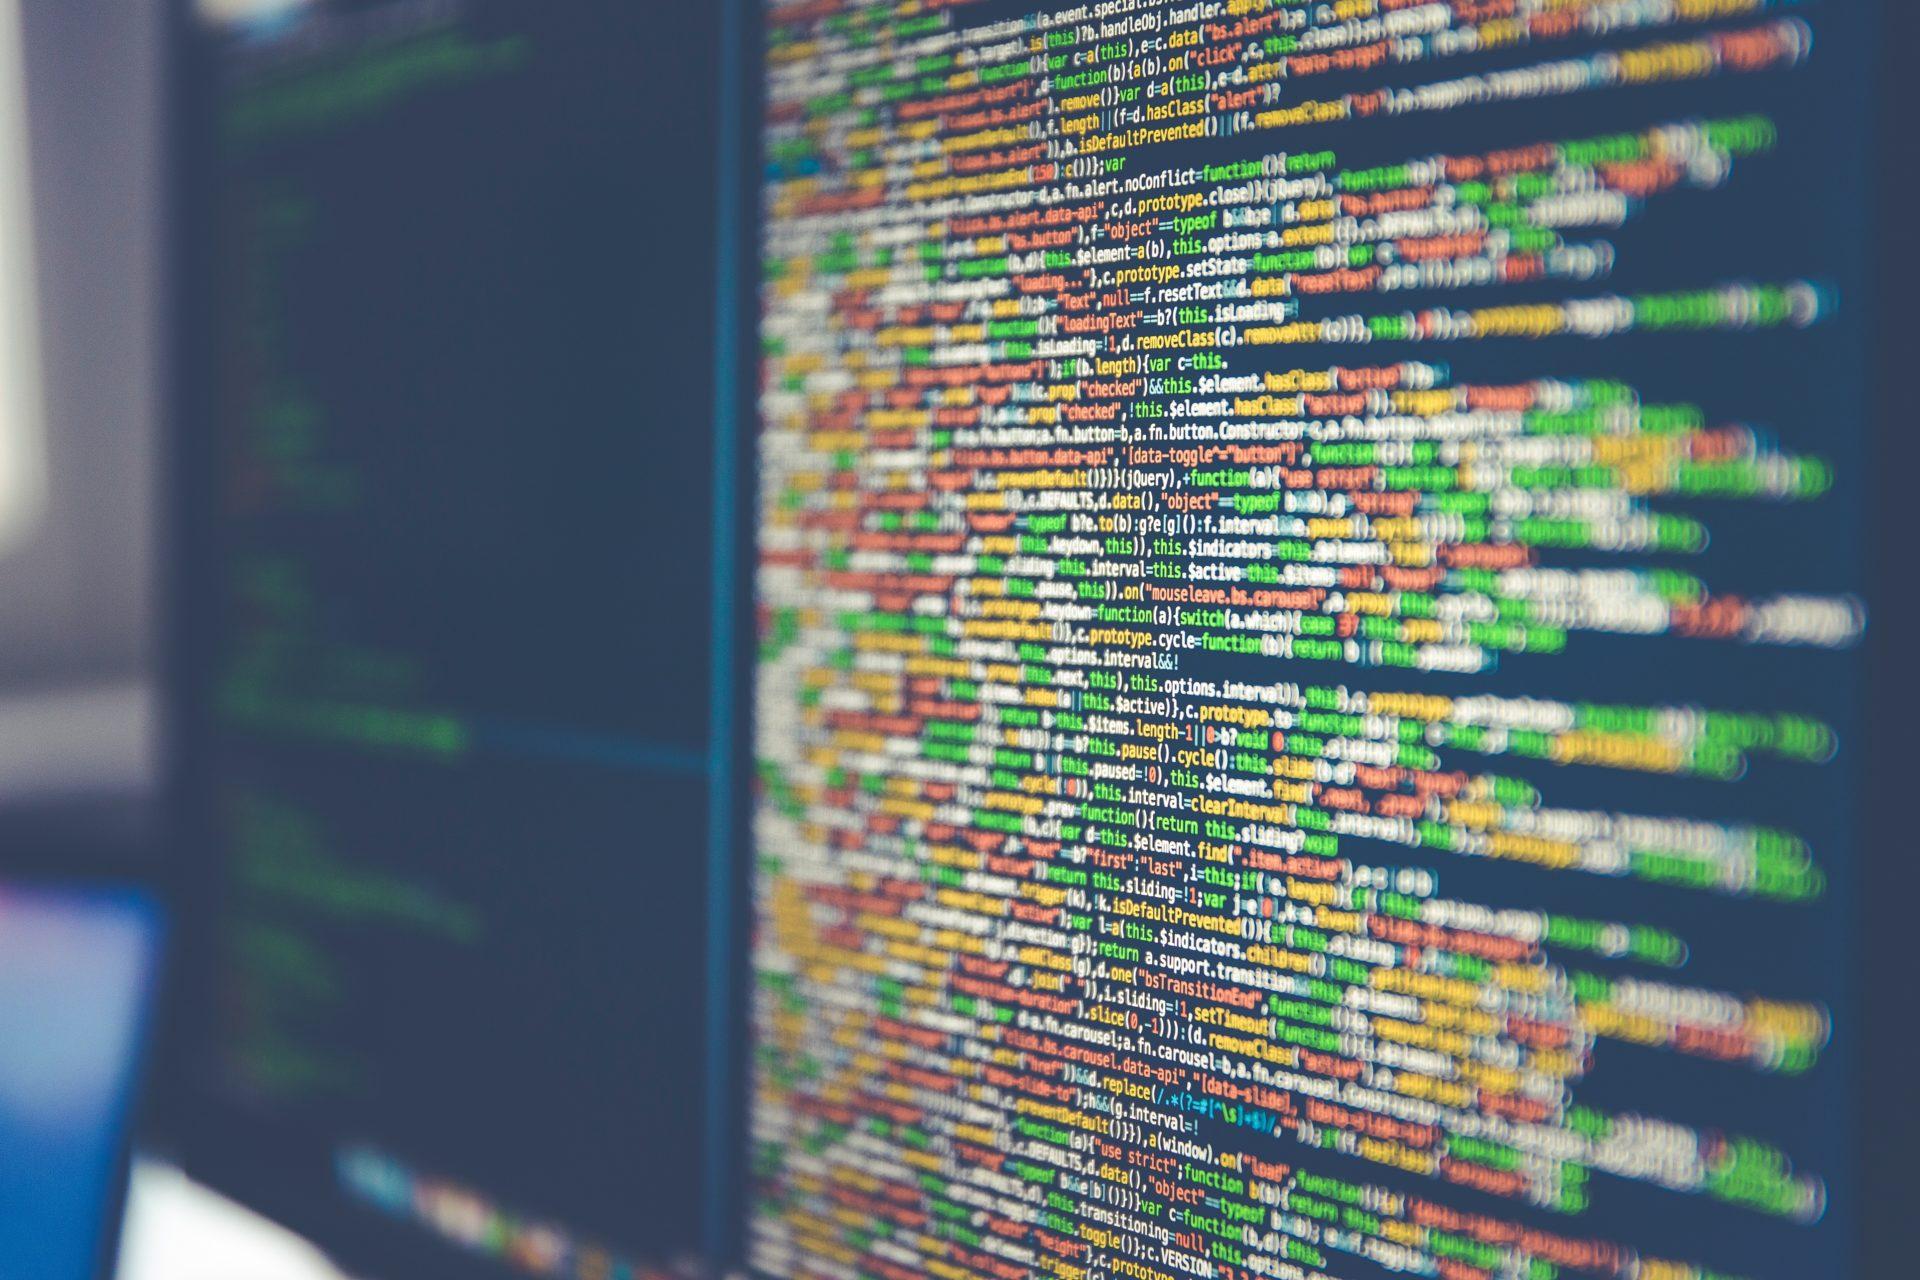 datos-big-data-ordenador-bbva-2017-11-08